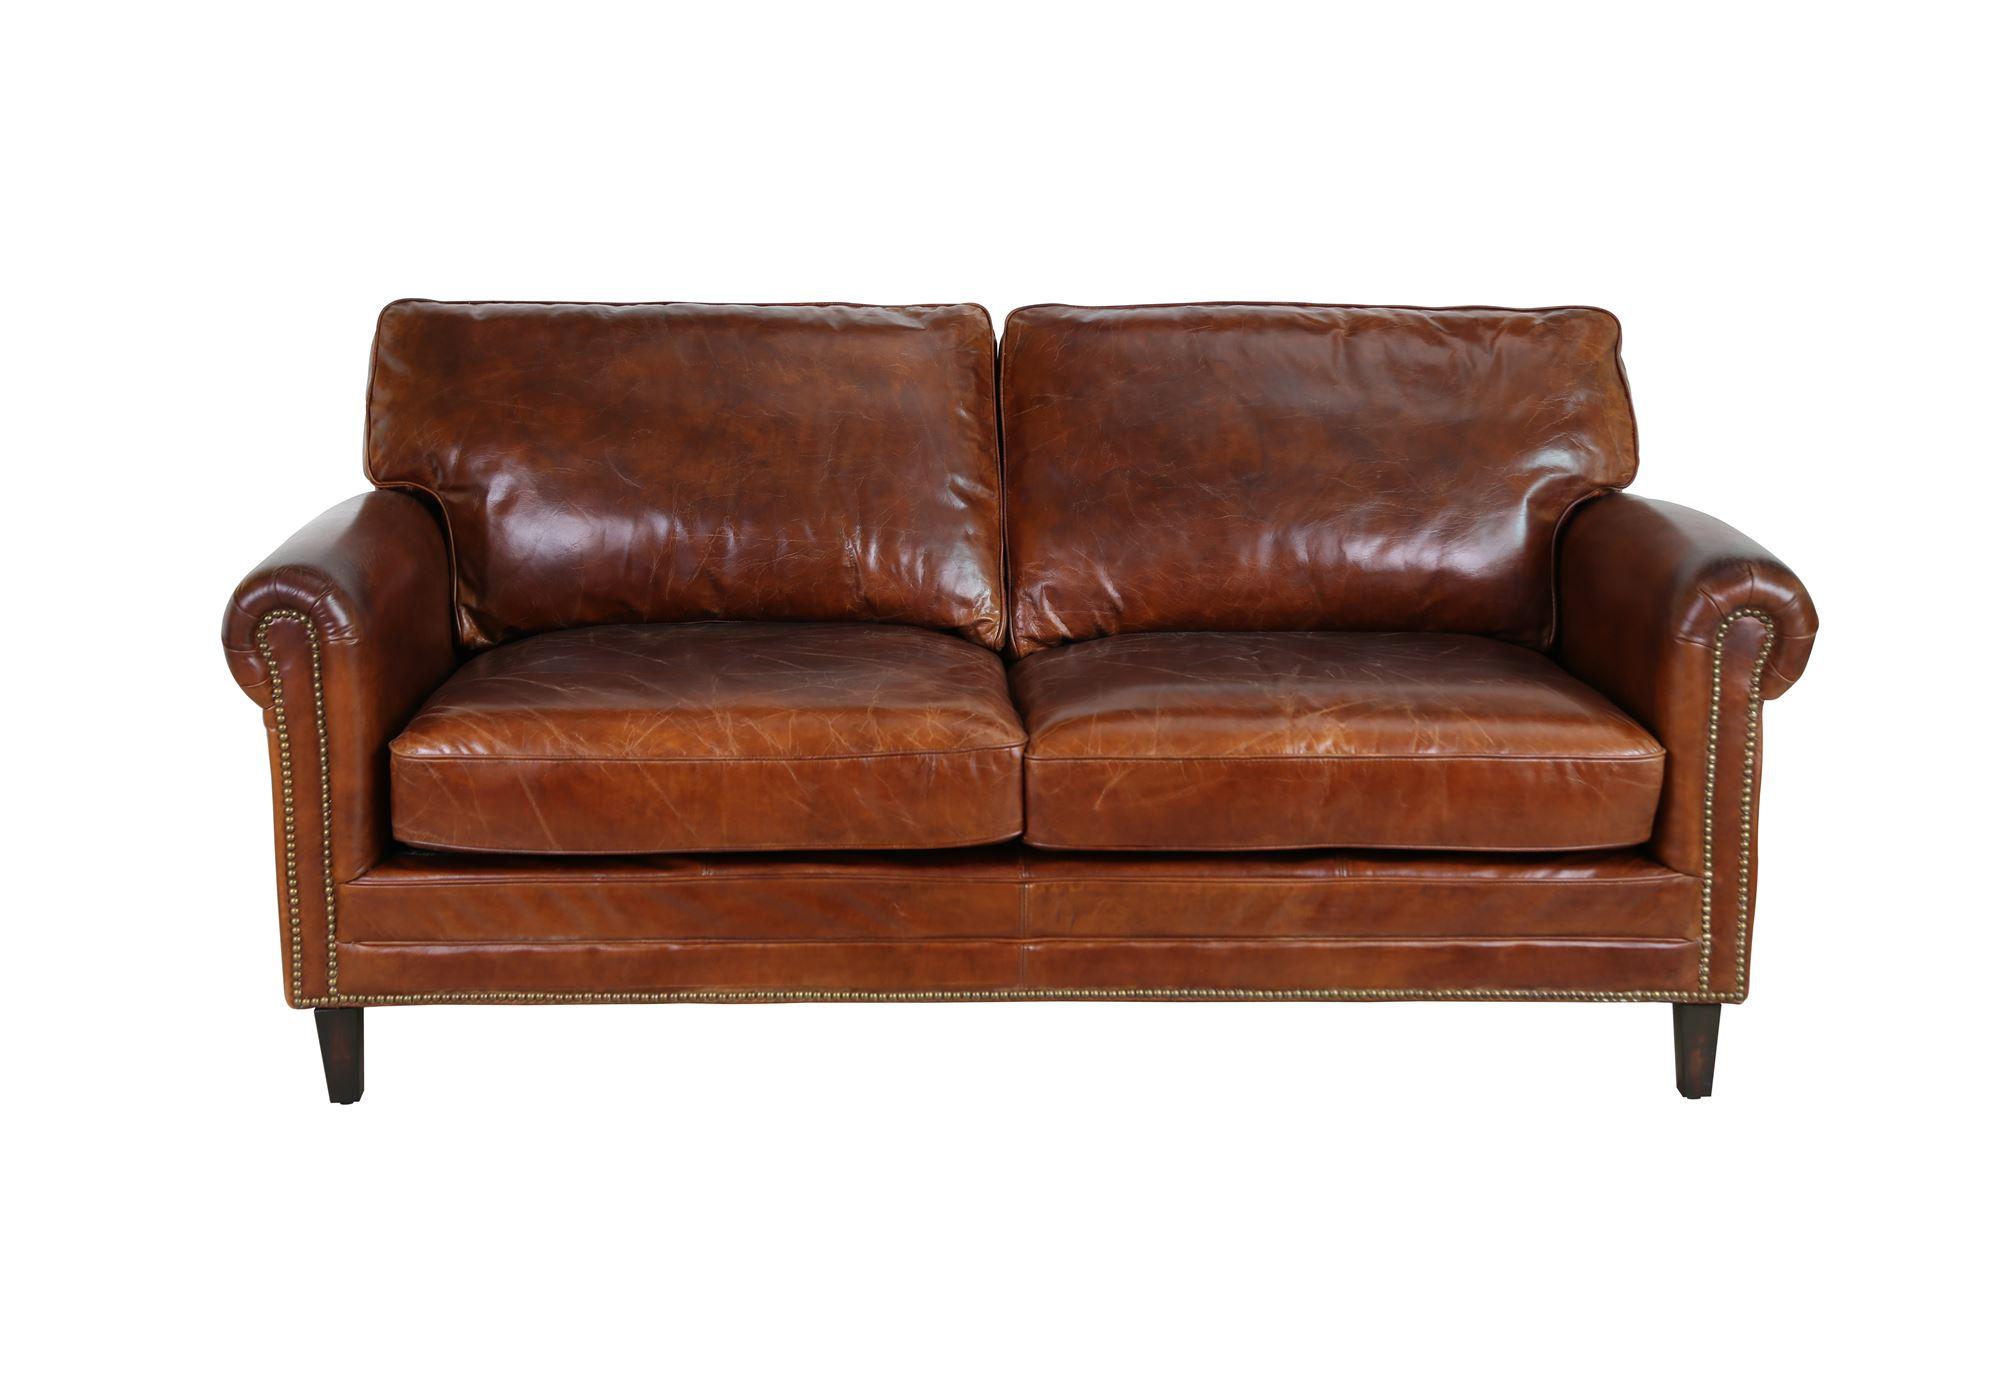 2 Pers Laeder Sofa Model Fairfield